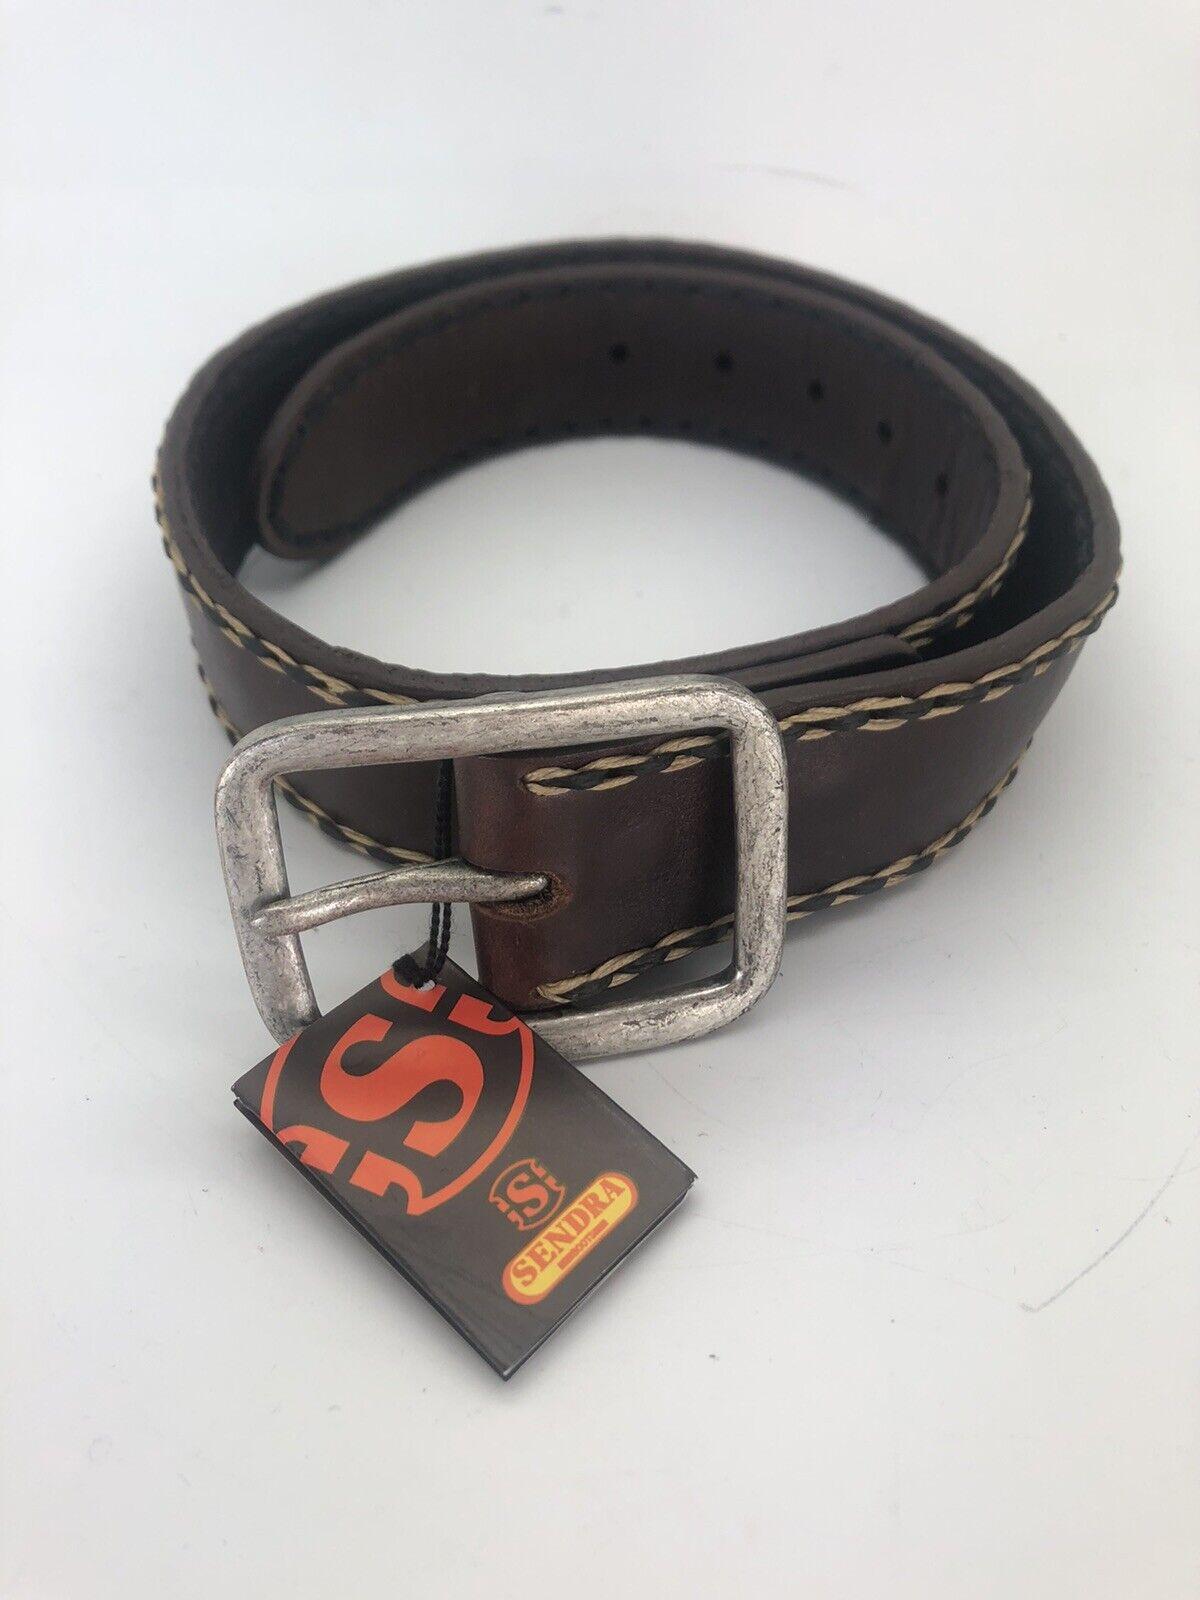 Belt Men's Sendra LEATHER SIZE M 75 Colour BROWN NEW